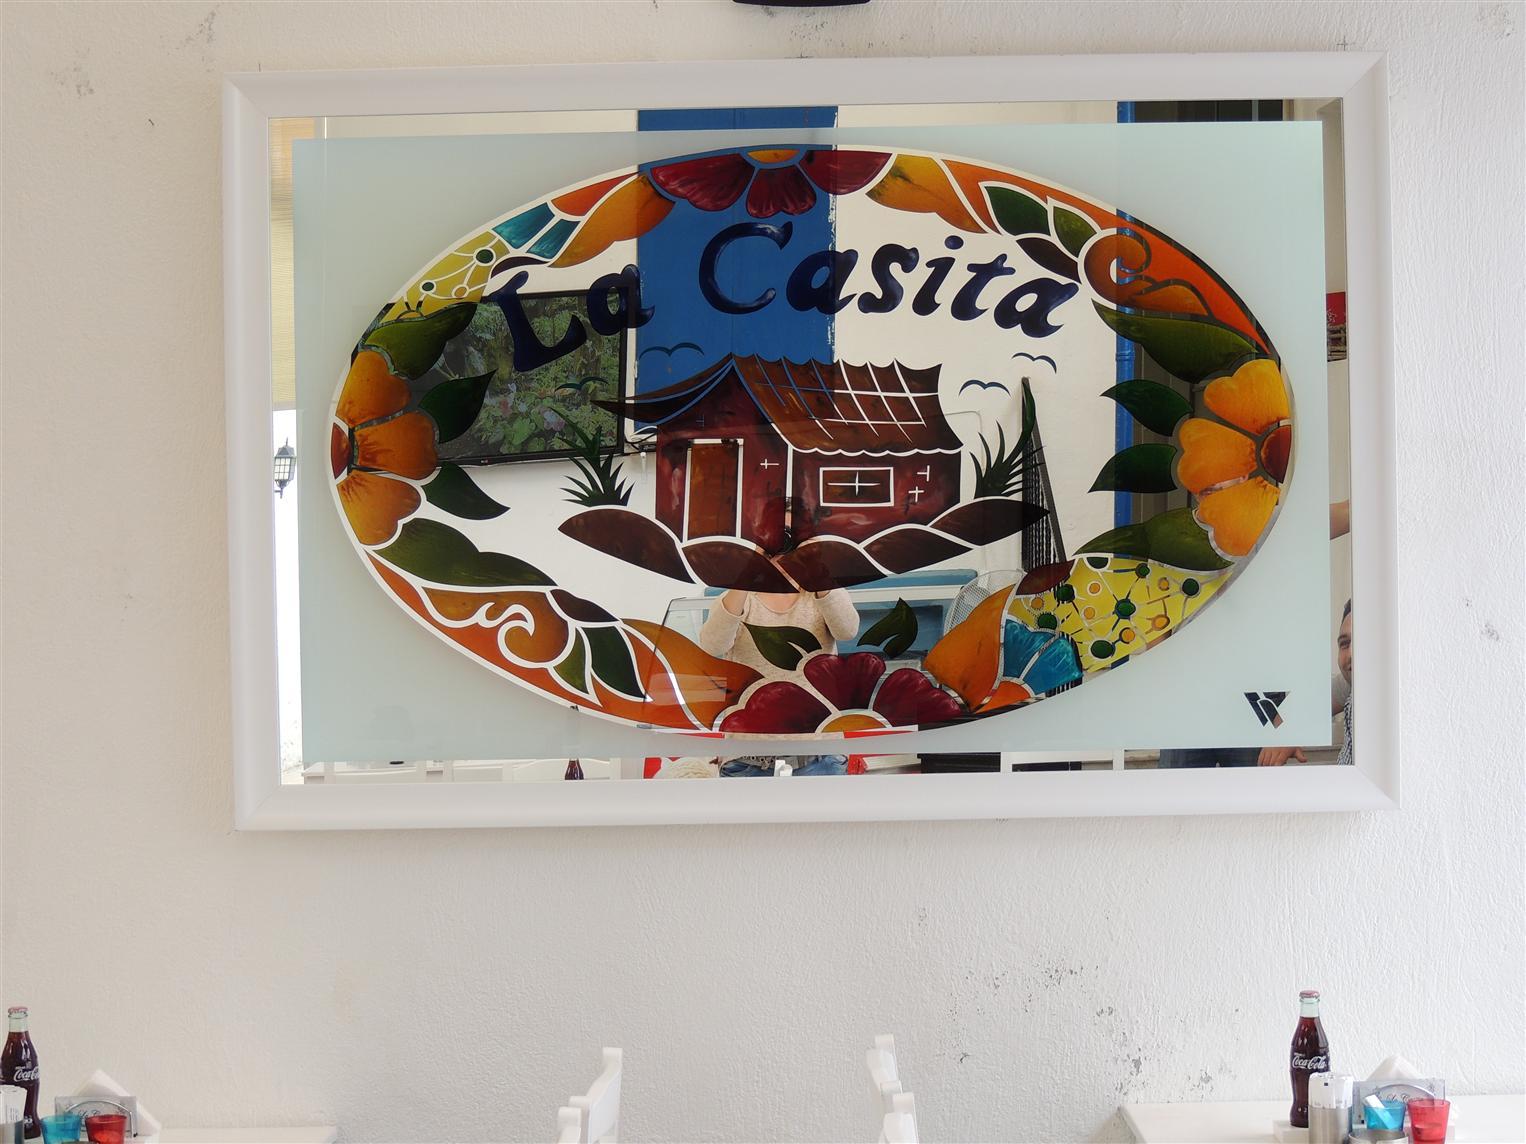 la-casita-cafe201592285043989.jpg izmir vitray çalışması